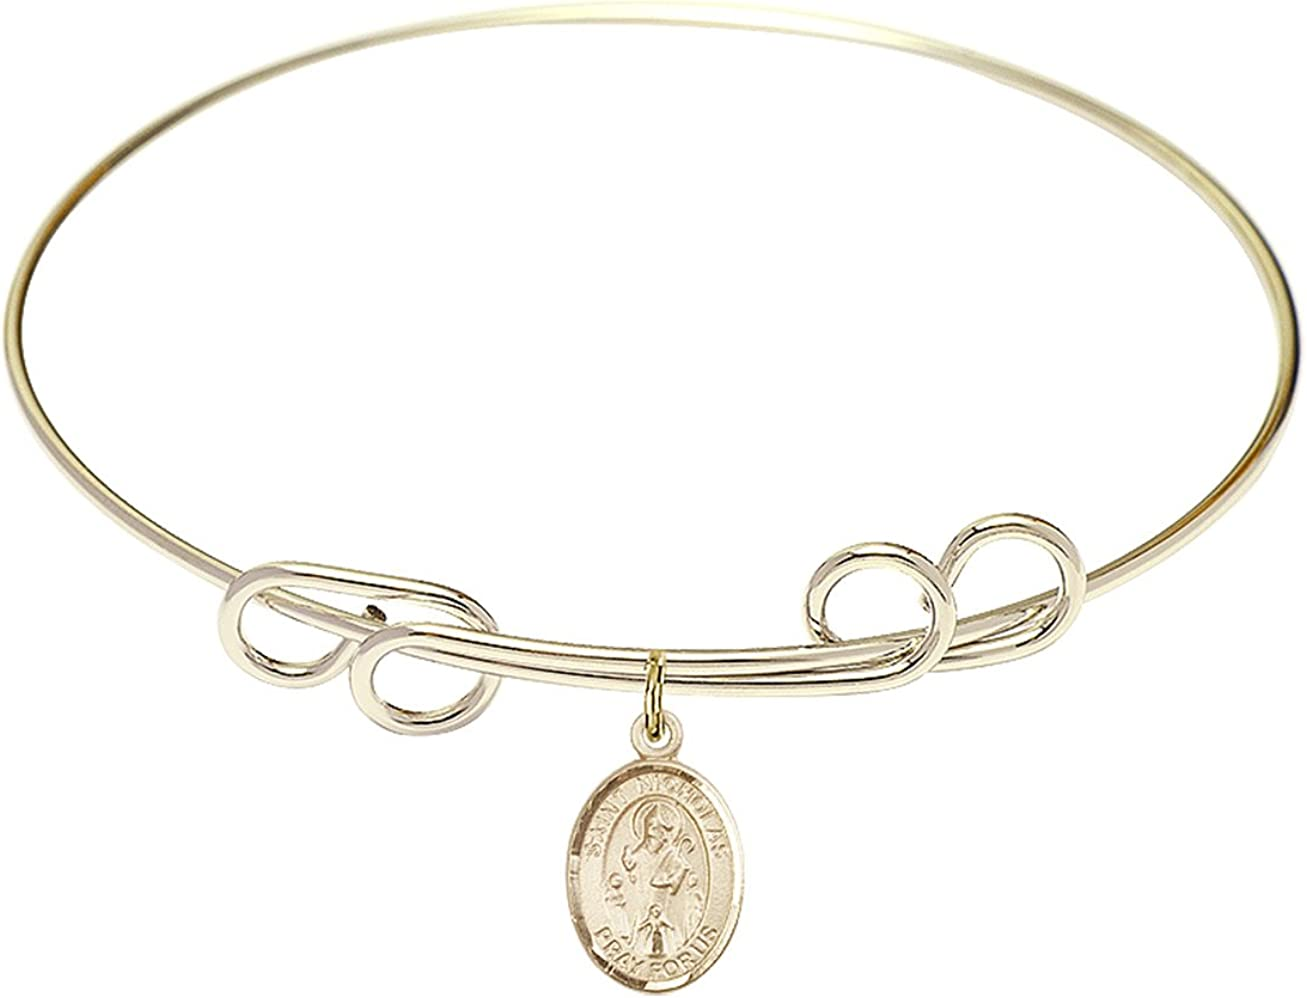 DiamondJewelryNY Double Loop Bangle Bracelet with a St. Nicholas Charm.